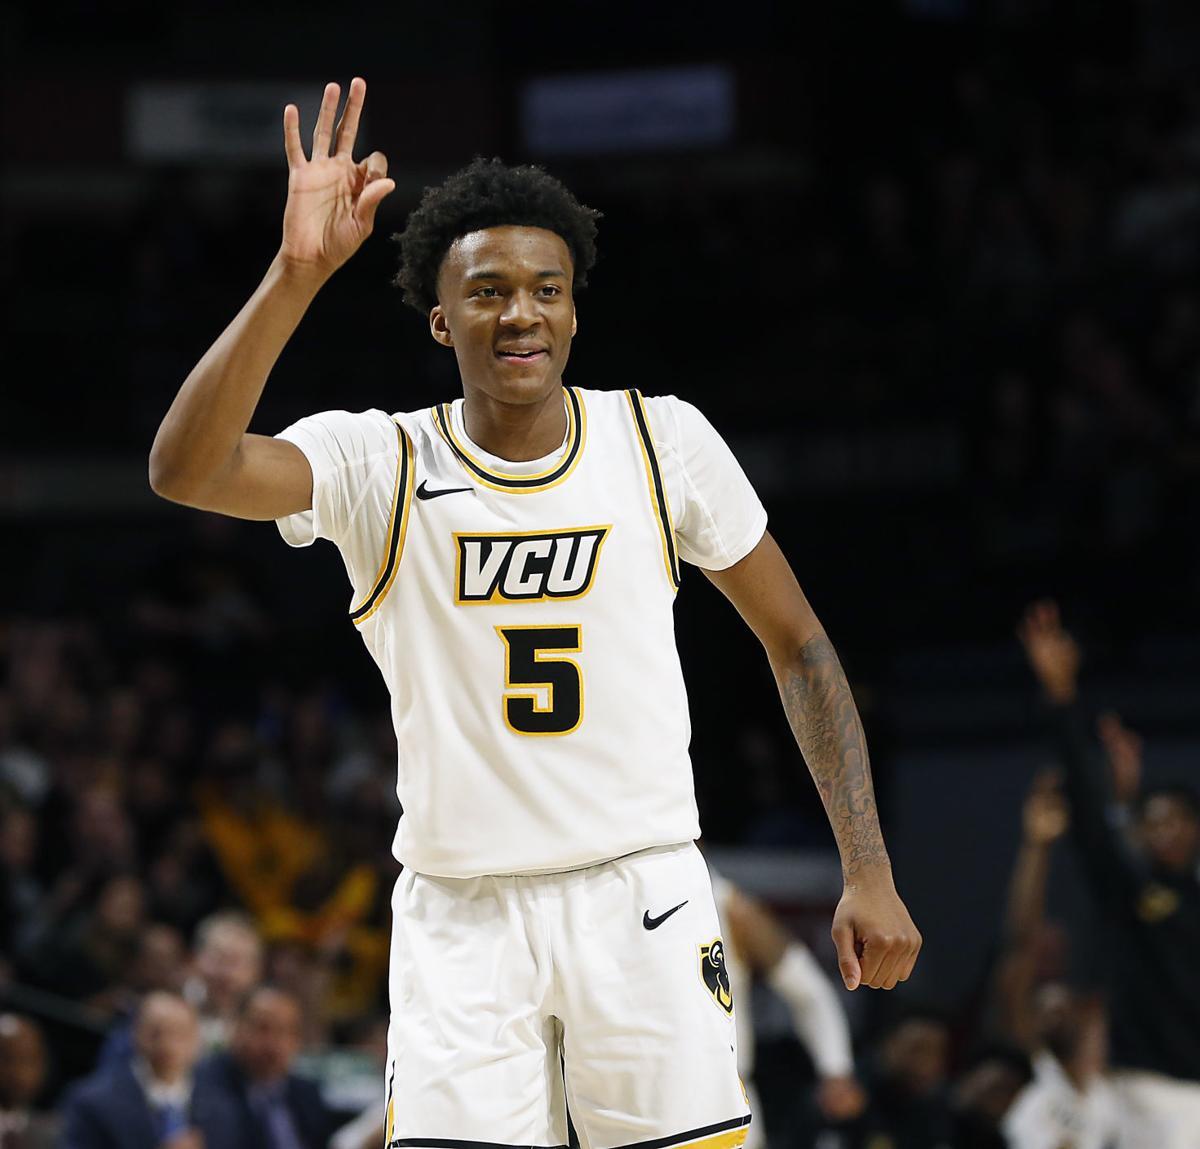 Bones Hyland breaks VCU freshman 3-point record | Plus | richmond.com